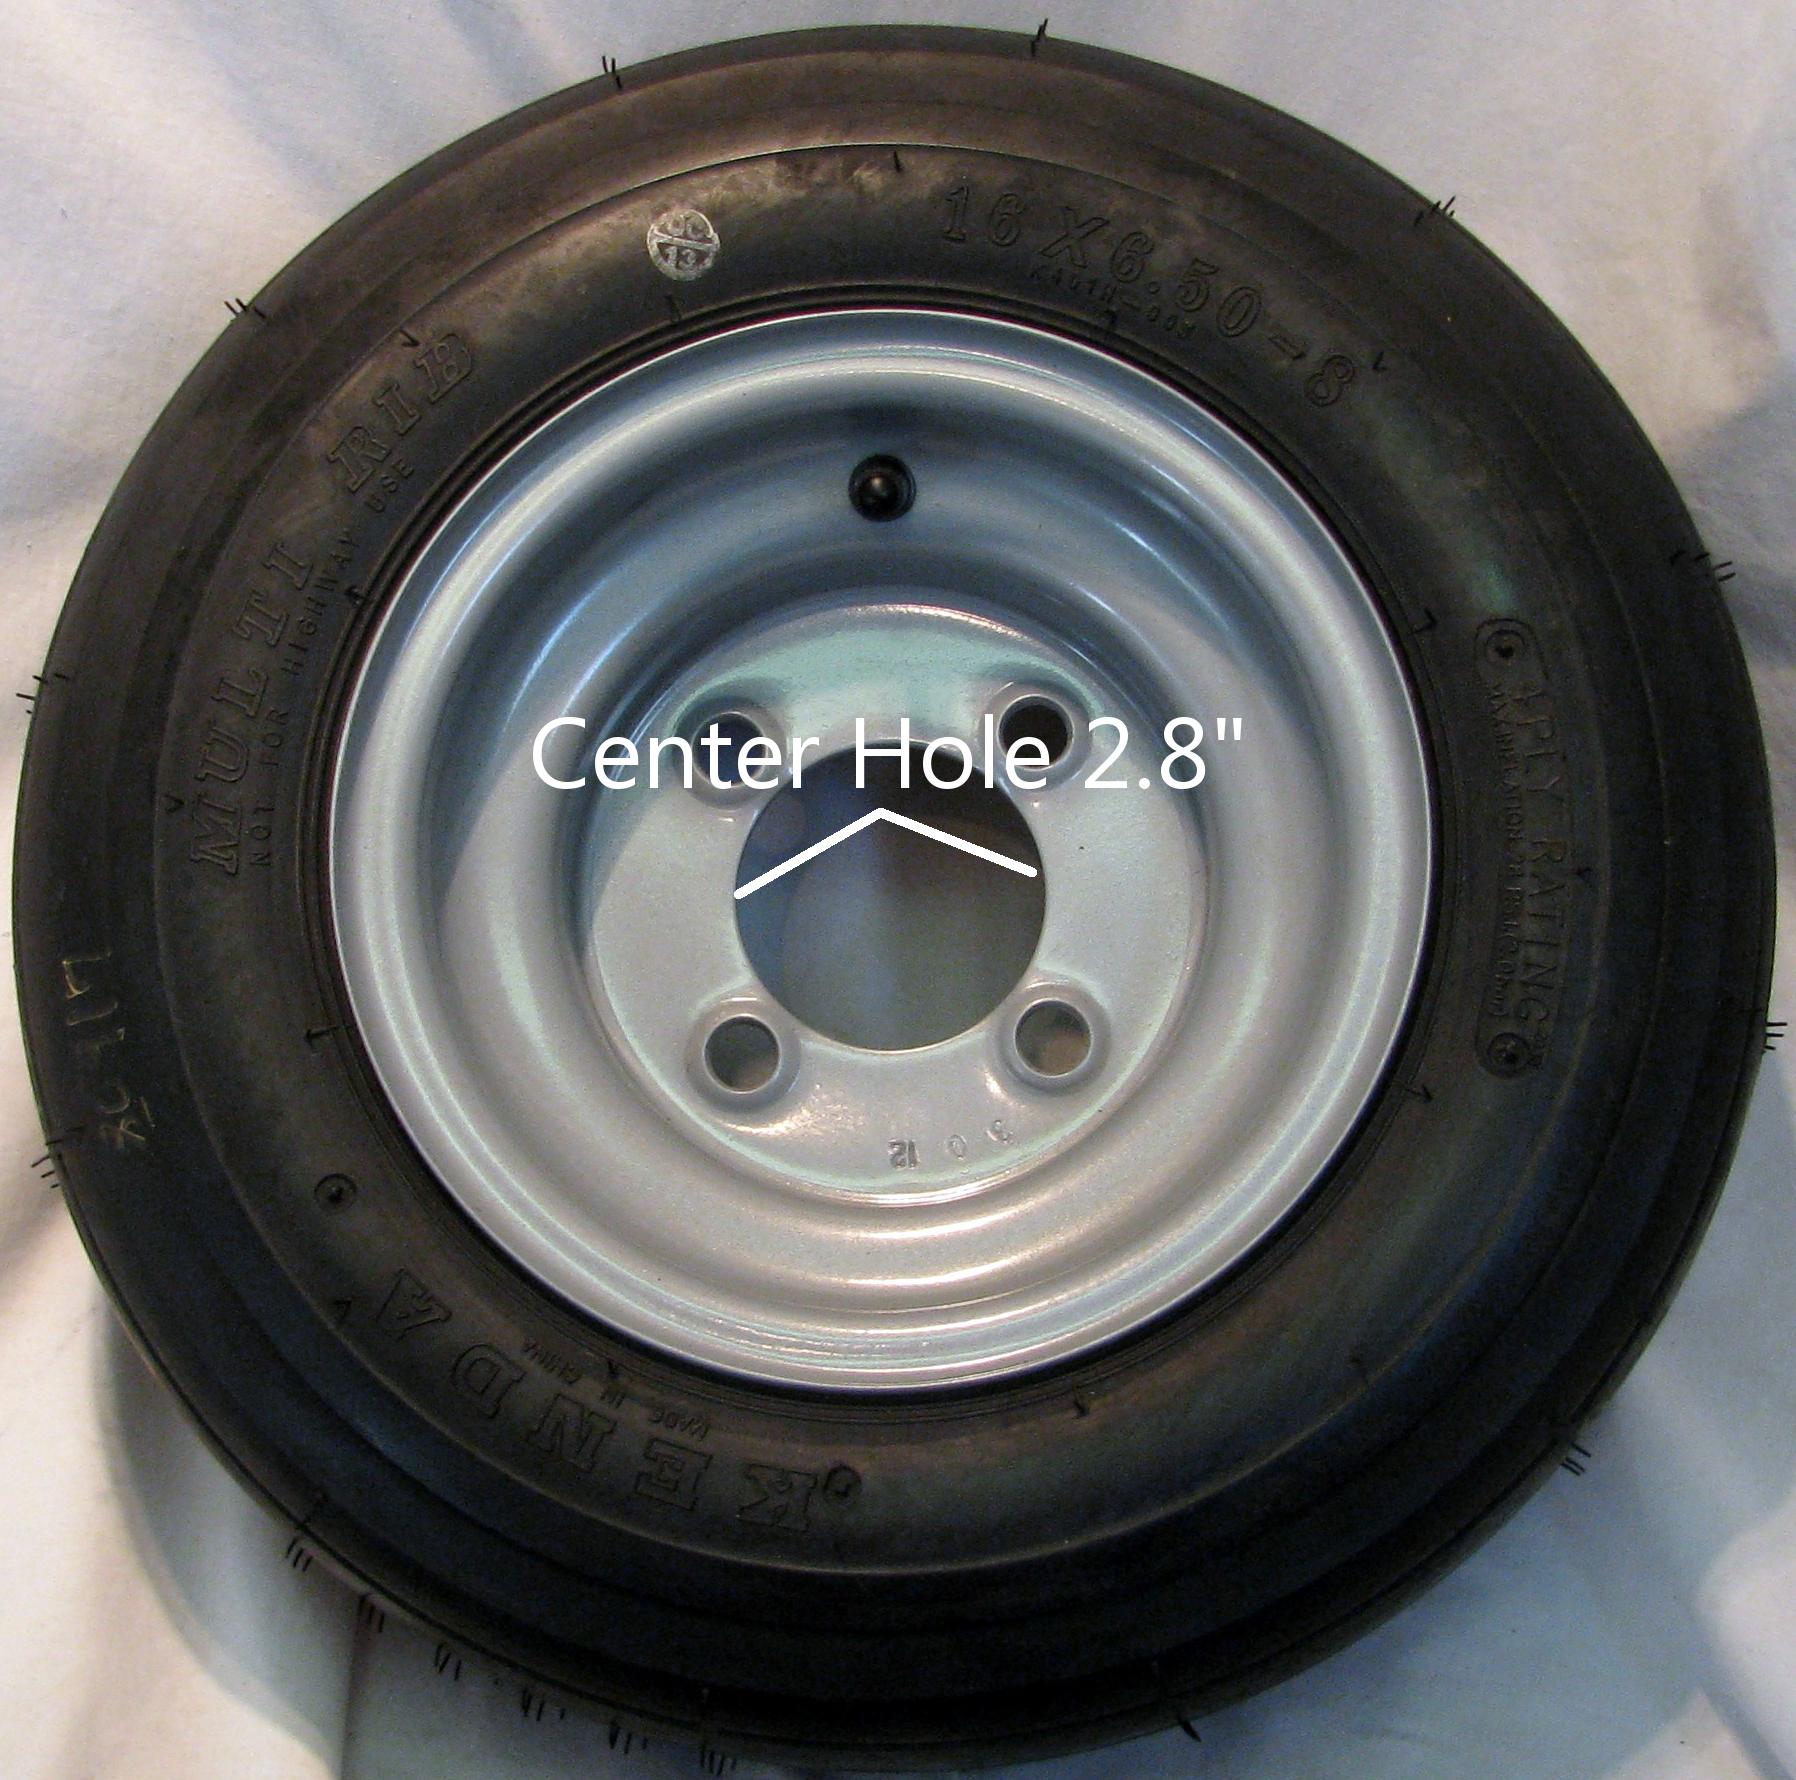 16x6 50 8 16x650 8 Tire Rim Wheel Assembly EV Master Go Kart Kenda K401 Rib 4ply